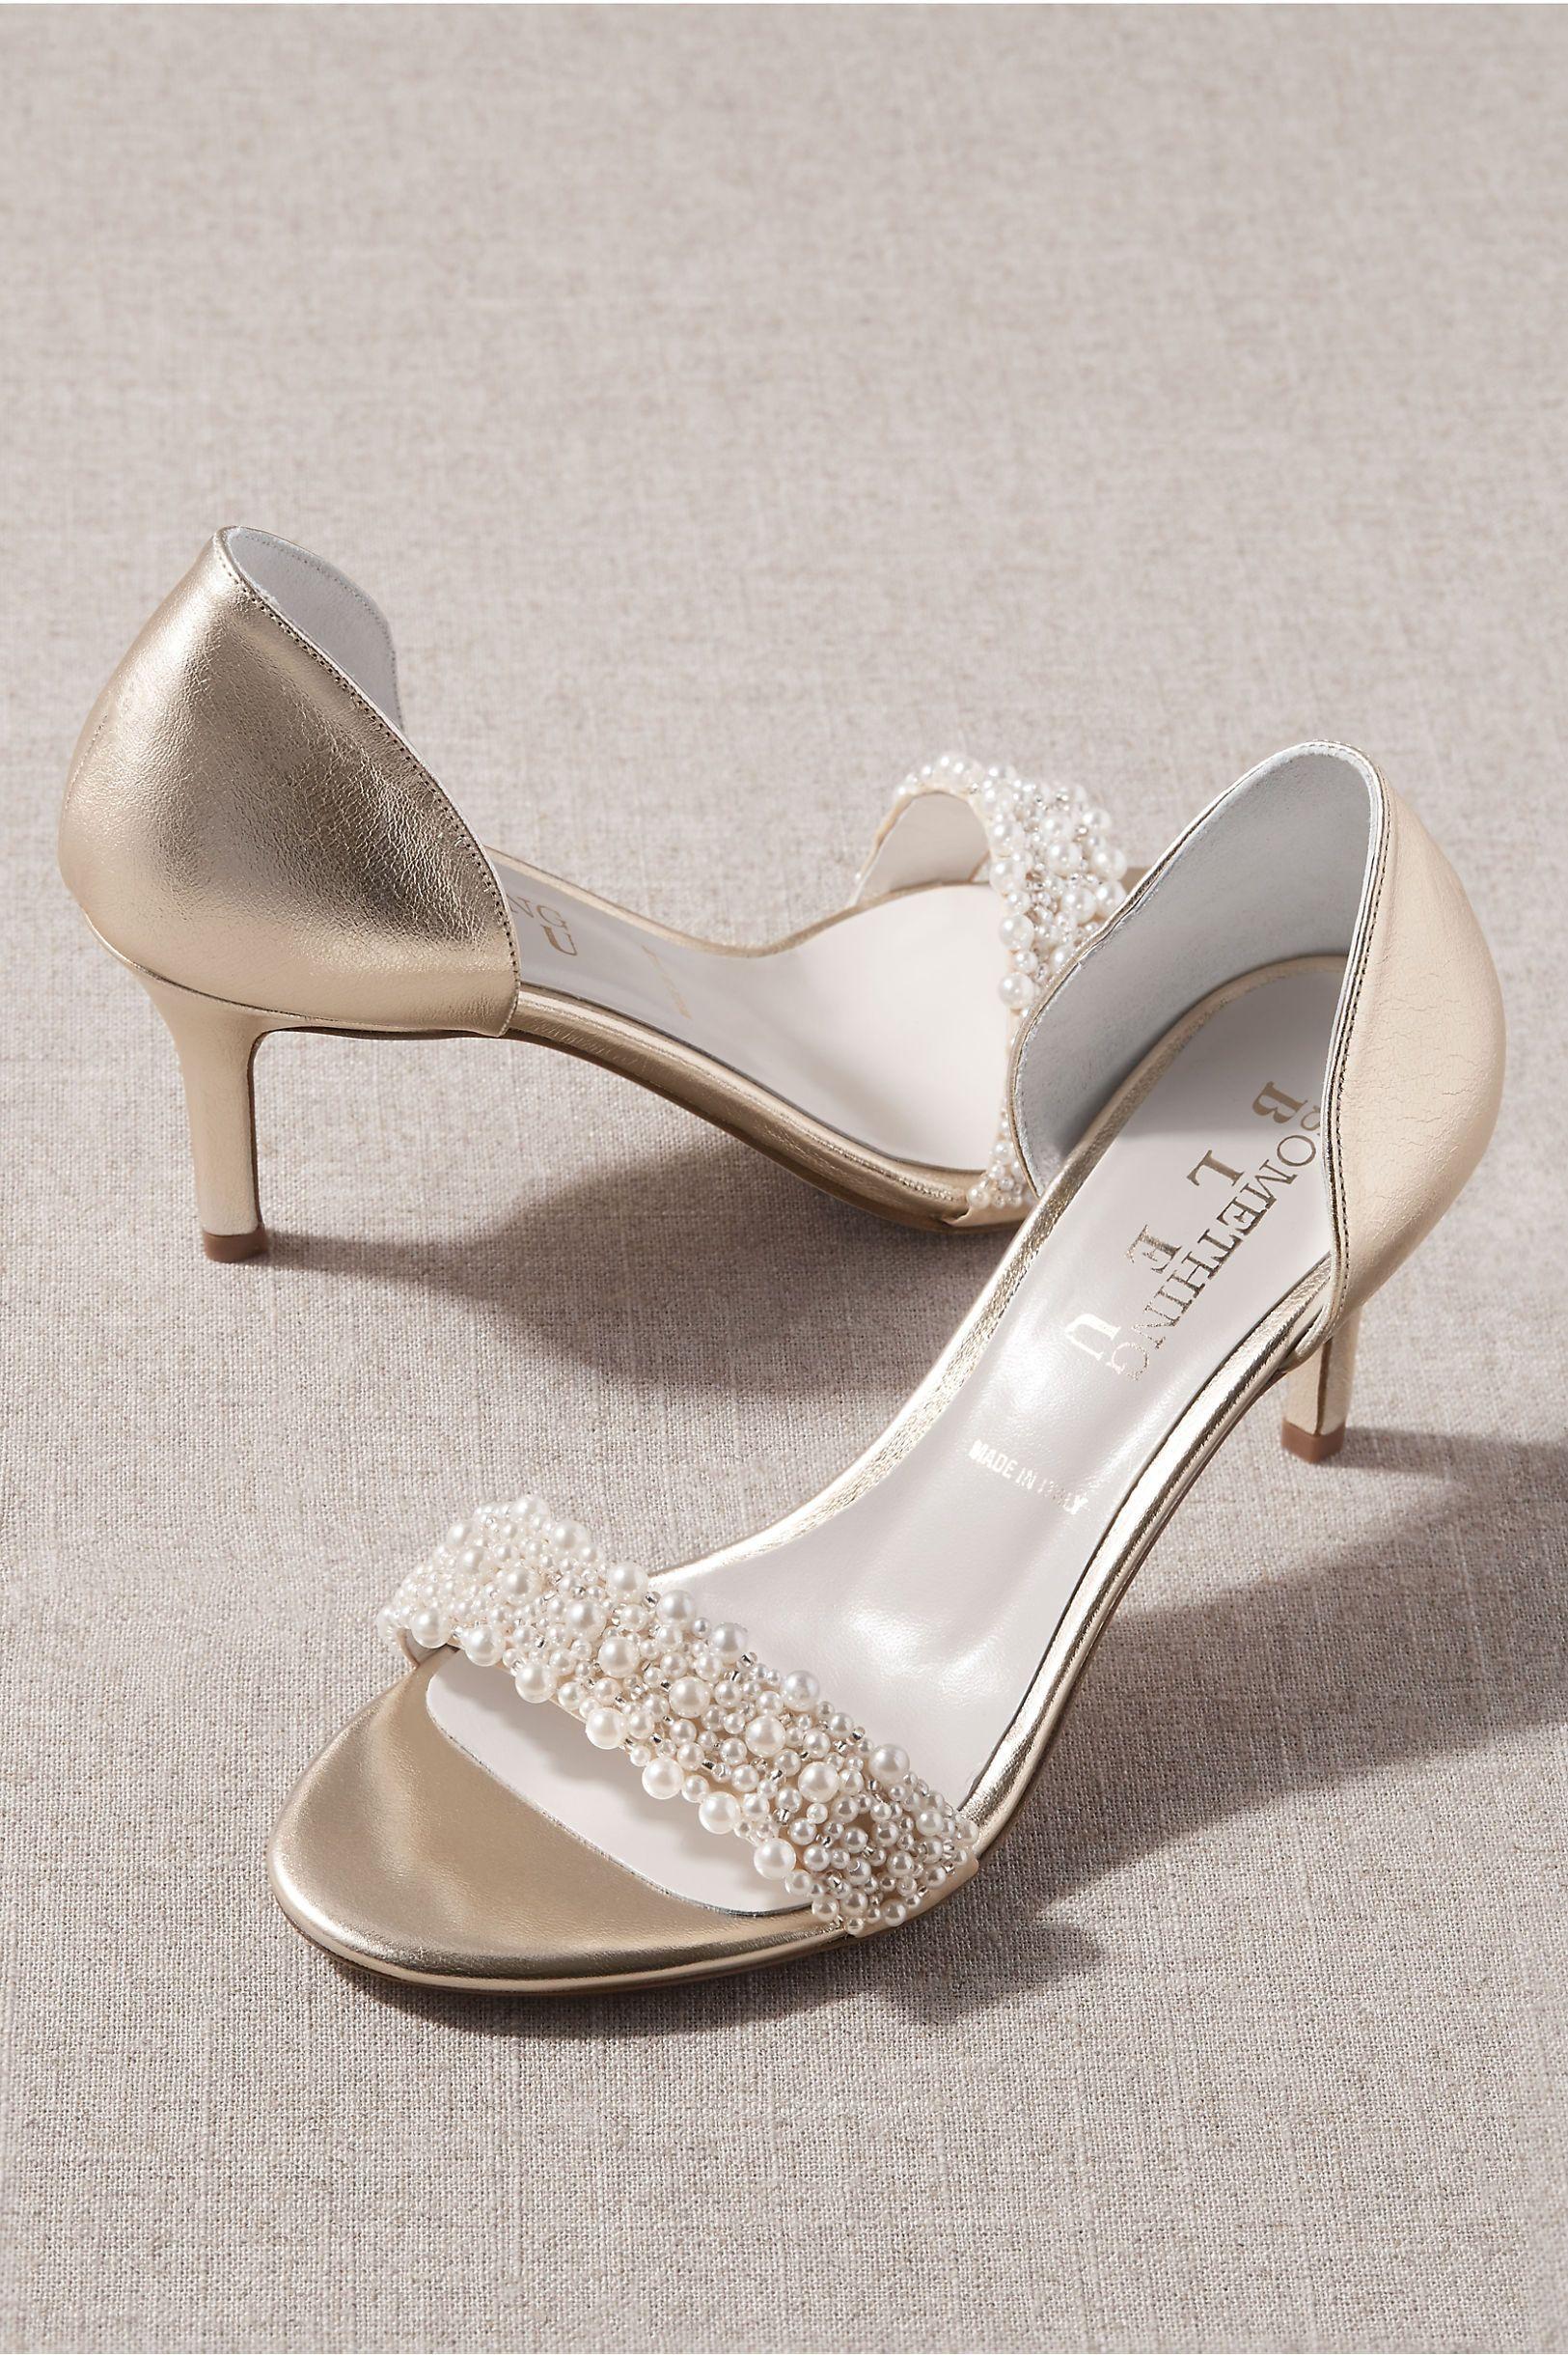 Something Bleu Cappy Heels In 2020 Wedding Shoes Comfortable Heels Bleu